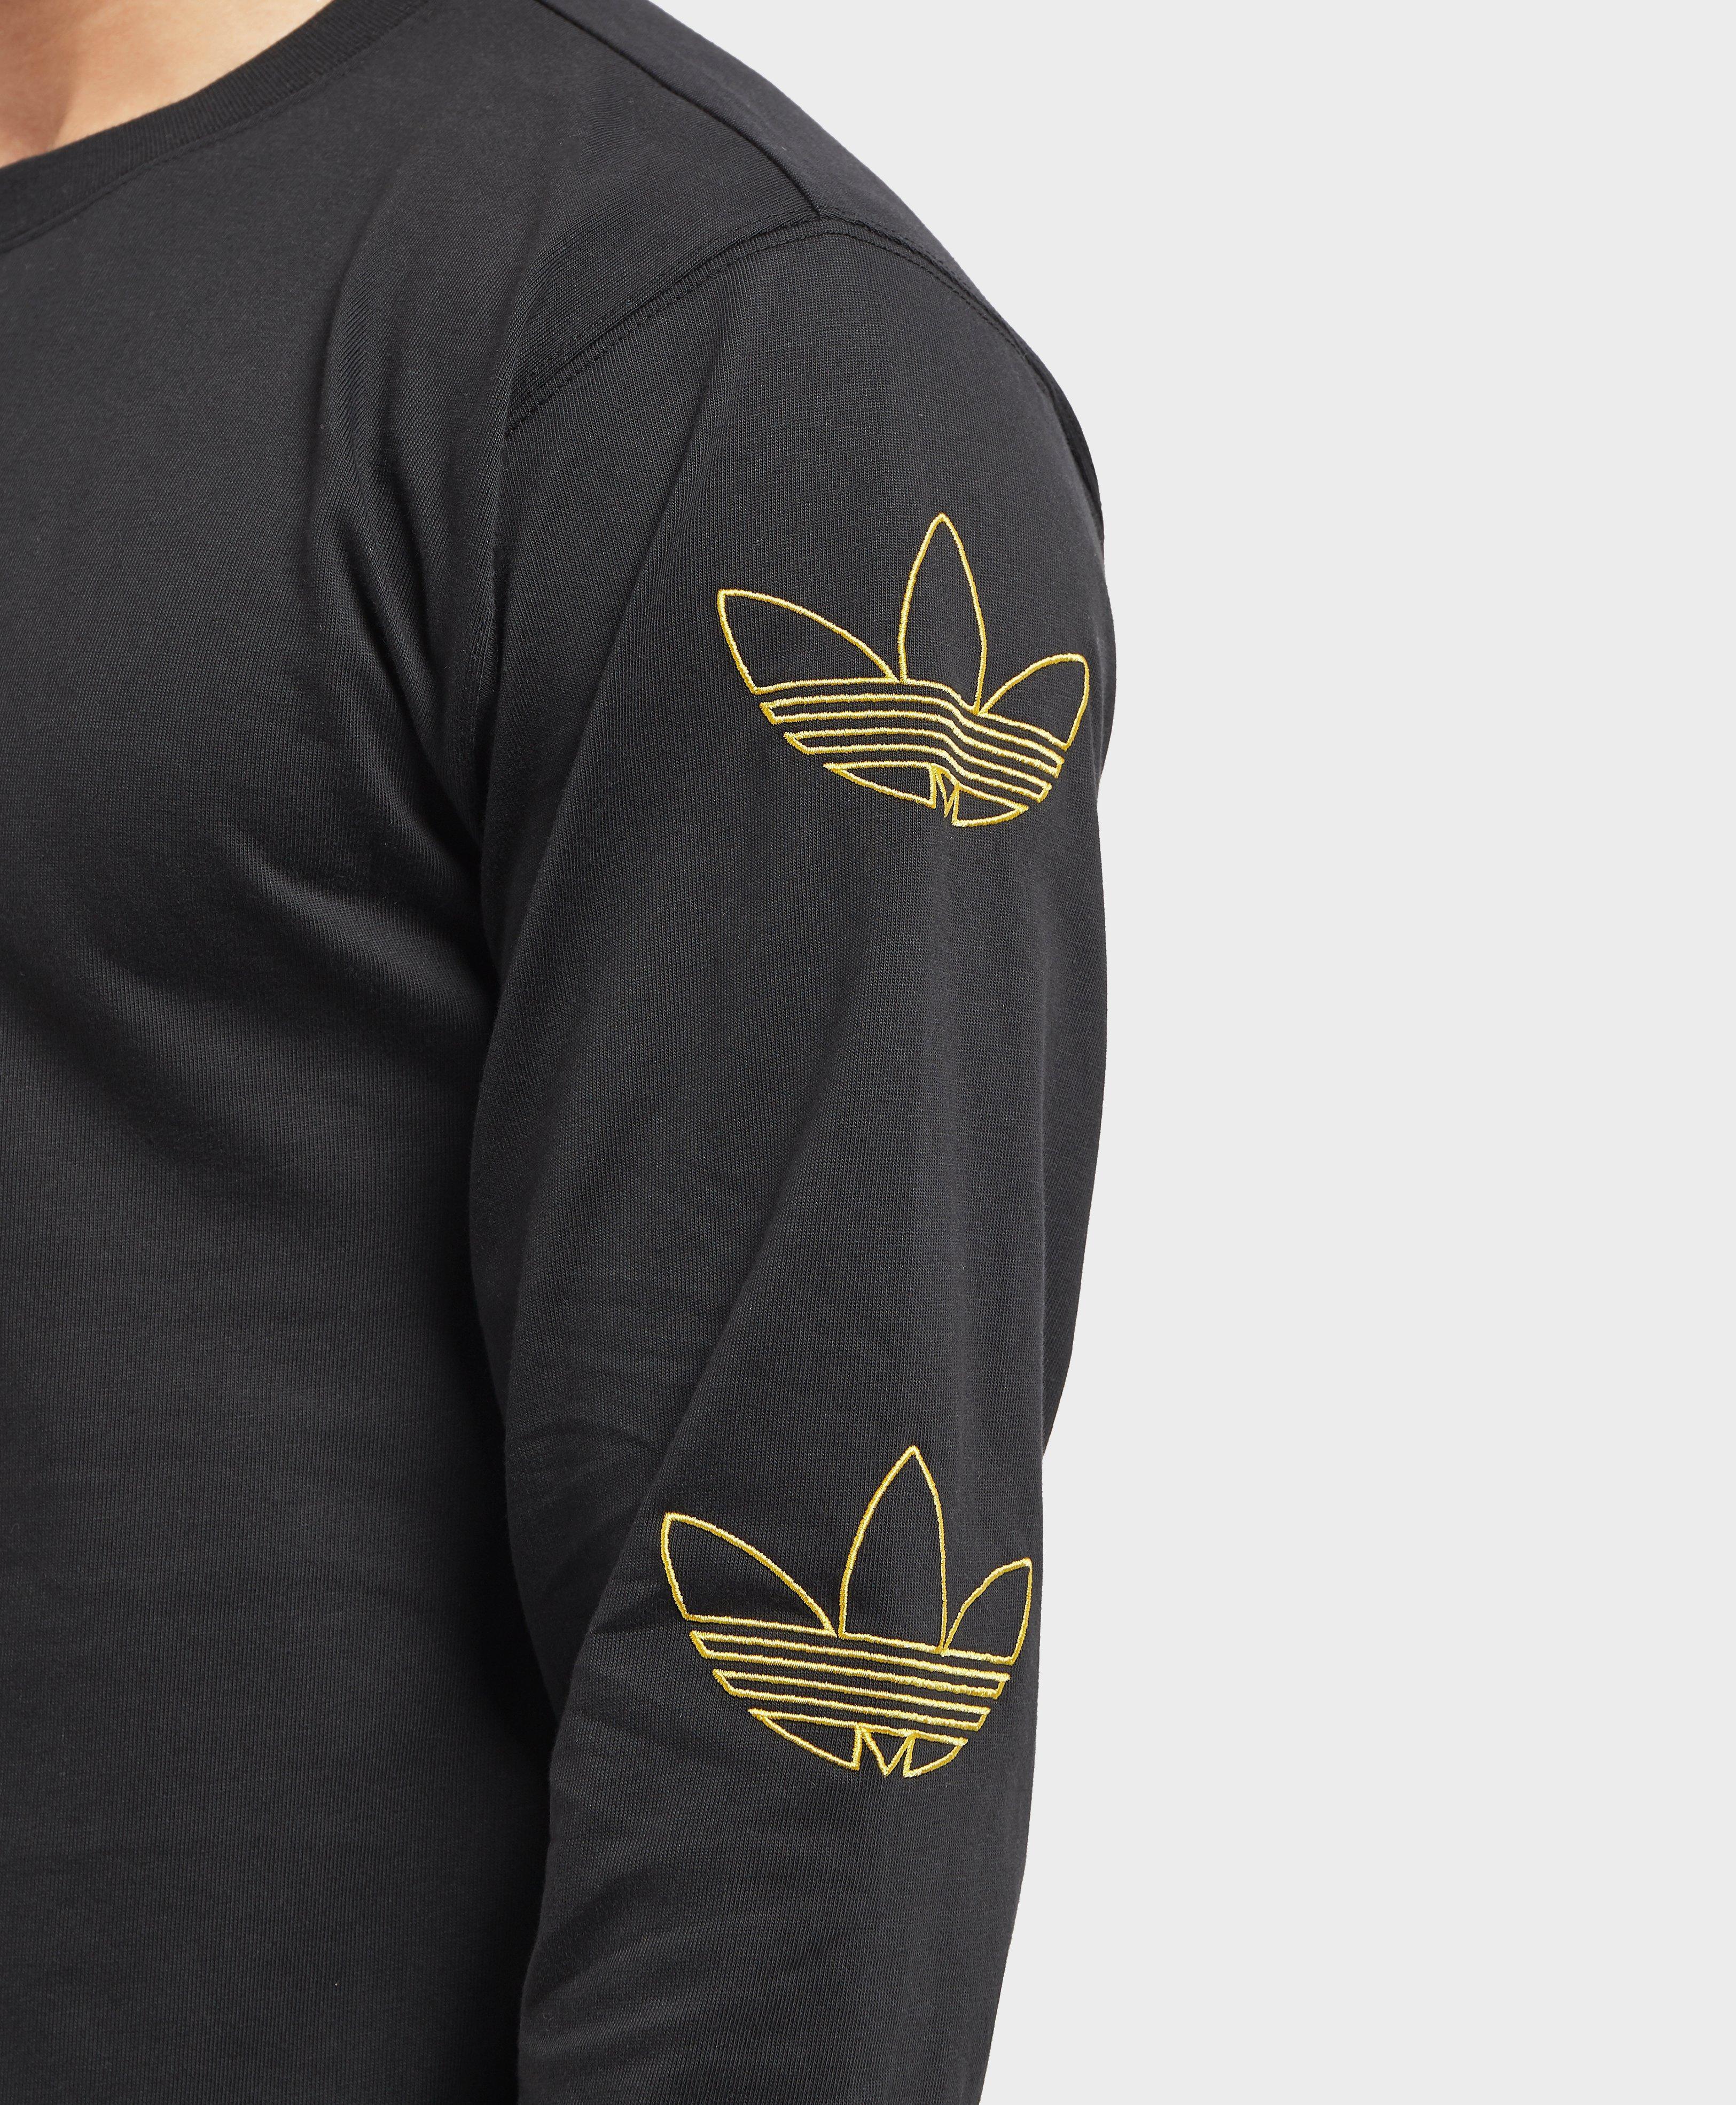 brand new d5965 f920d Adidas Originals - Black Trefoil Stack Long Sleeve T-shirt for Men - Lyst.  View fullscreen